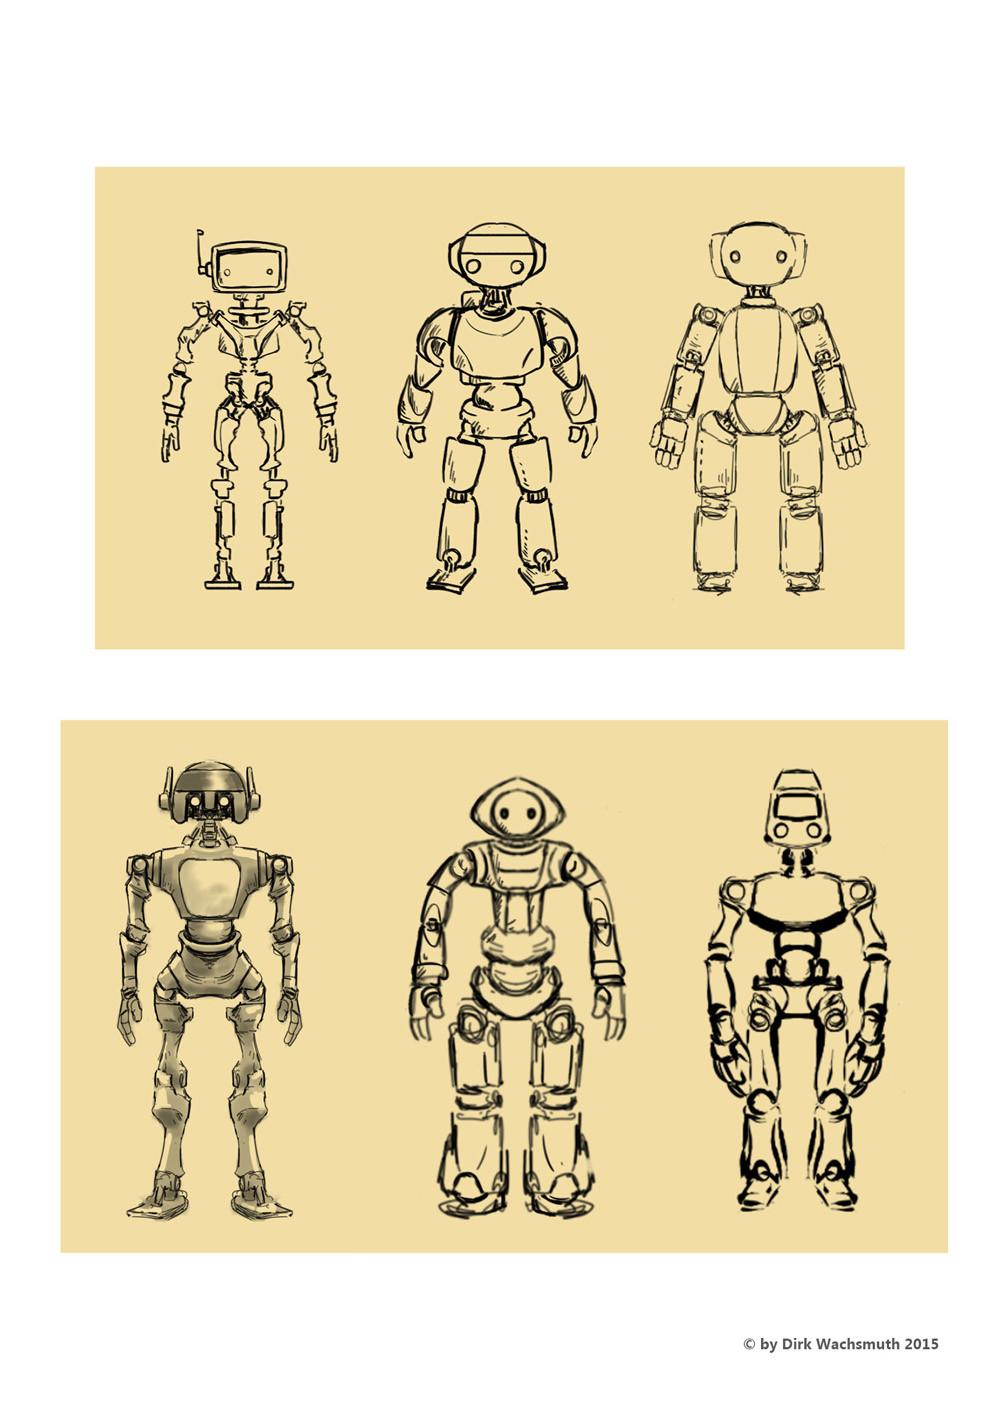 Dirk wachsmuth robot concepts alphama8